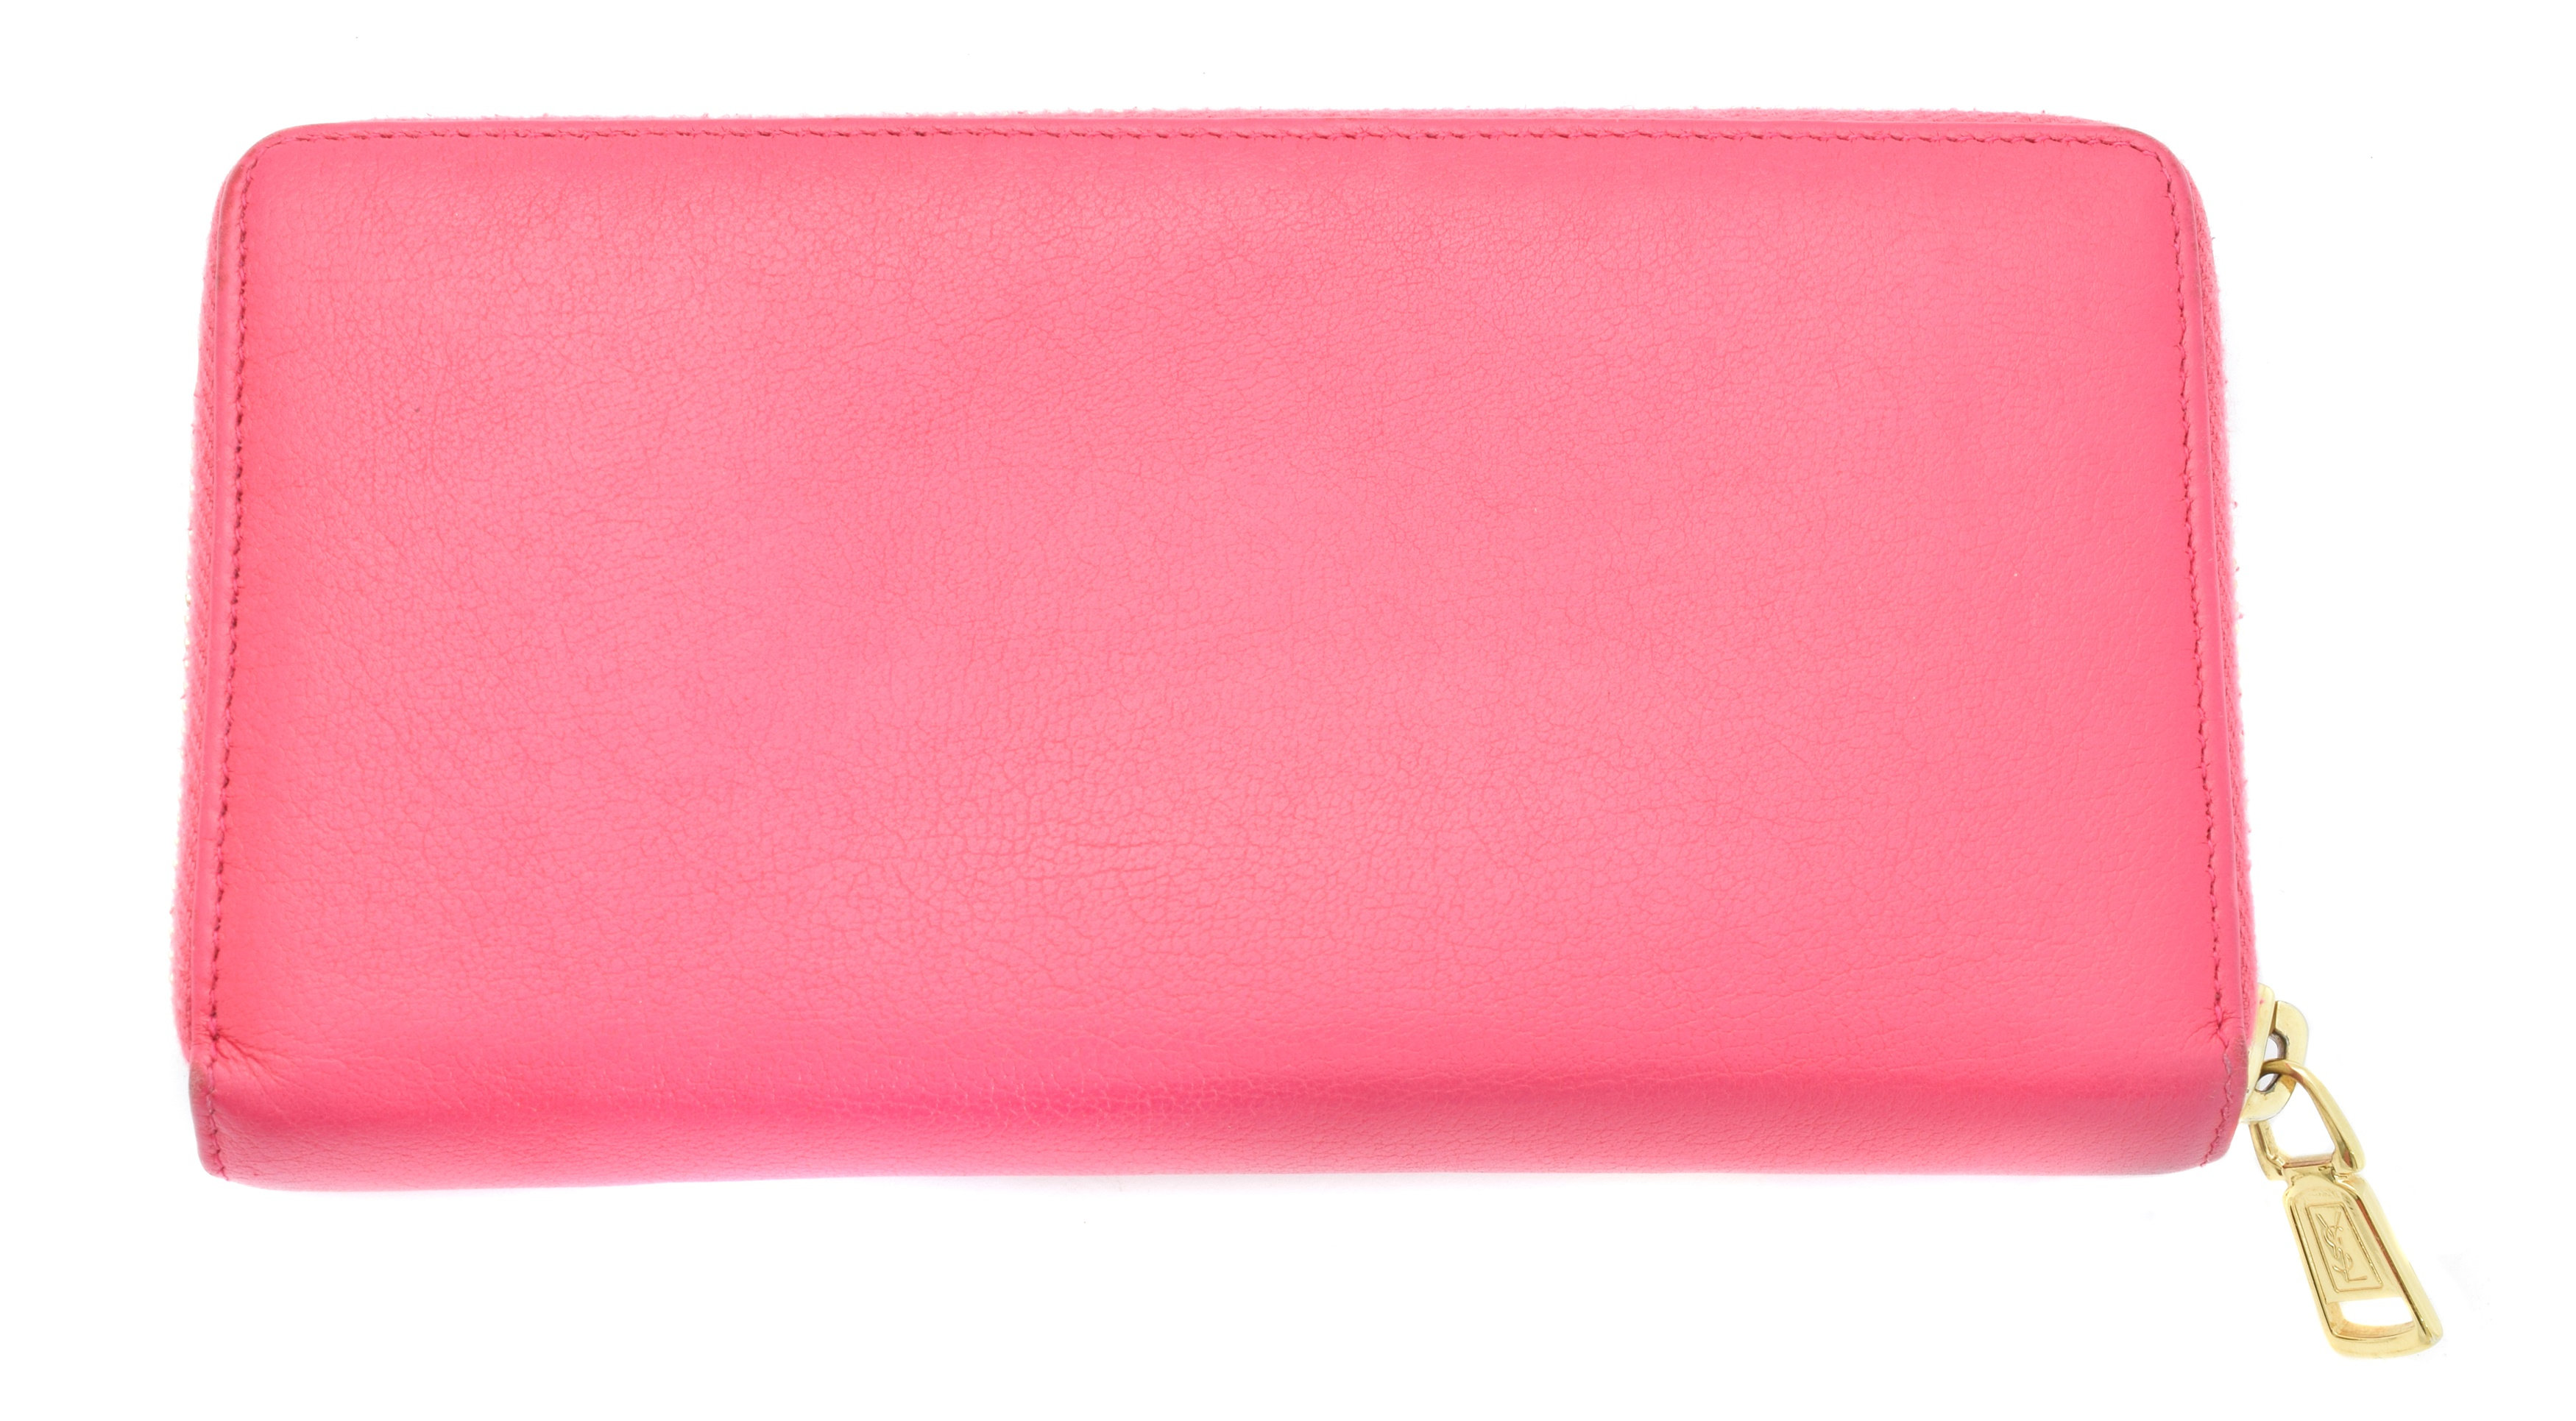 A Yves Saint Laurent zip around logo wallet, - Image 2 of 2